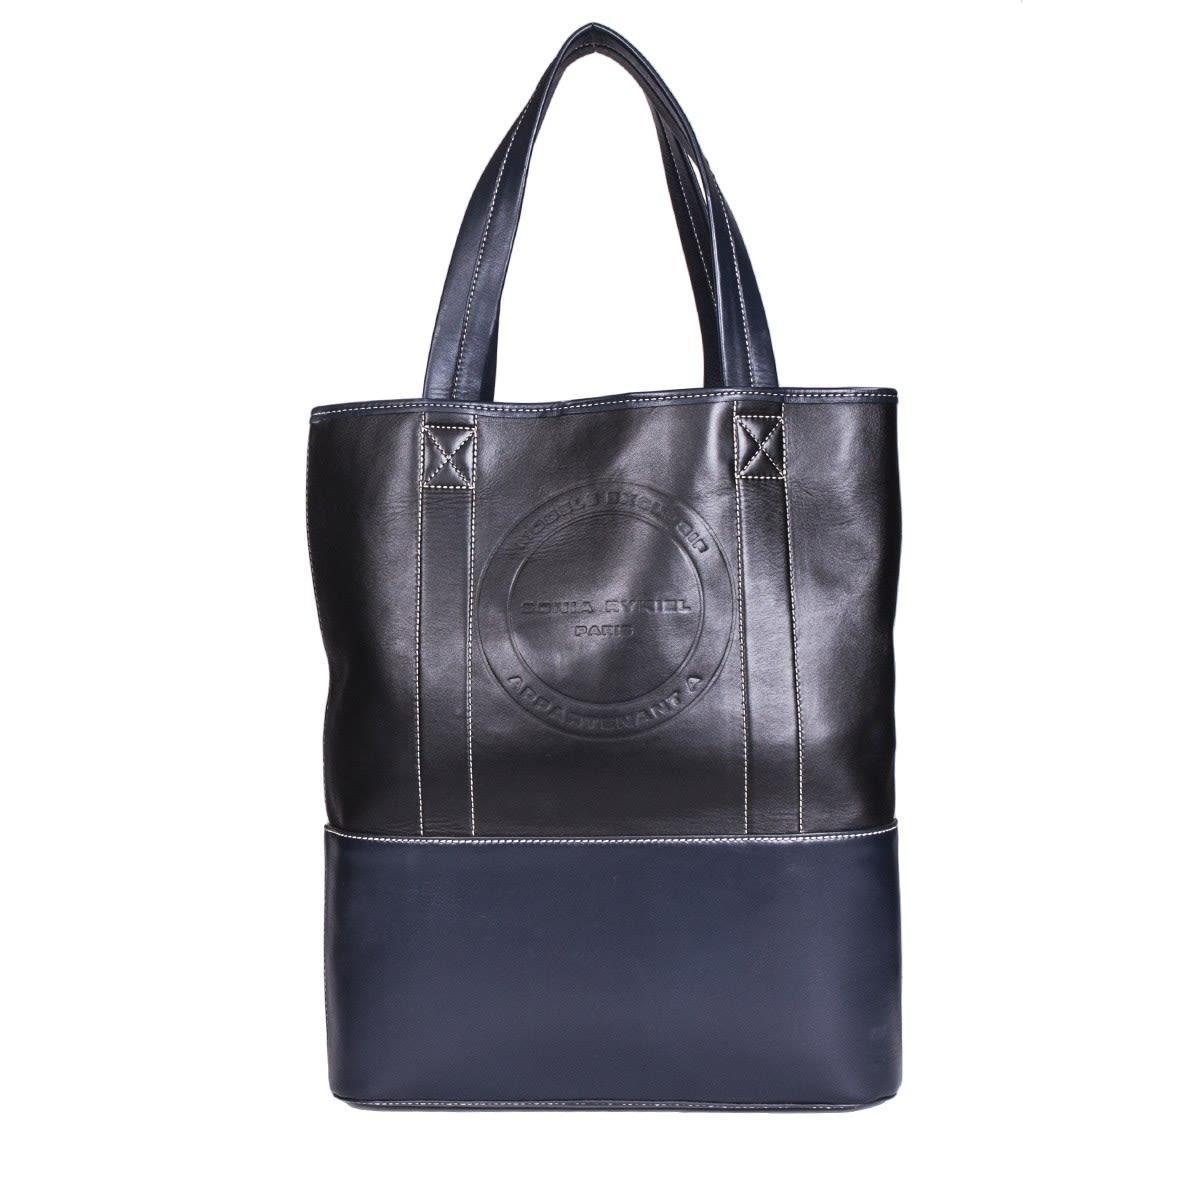 Sonia Rykiel Leather Seilor Tote Bag In Multicolor